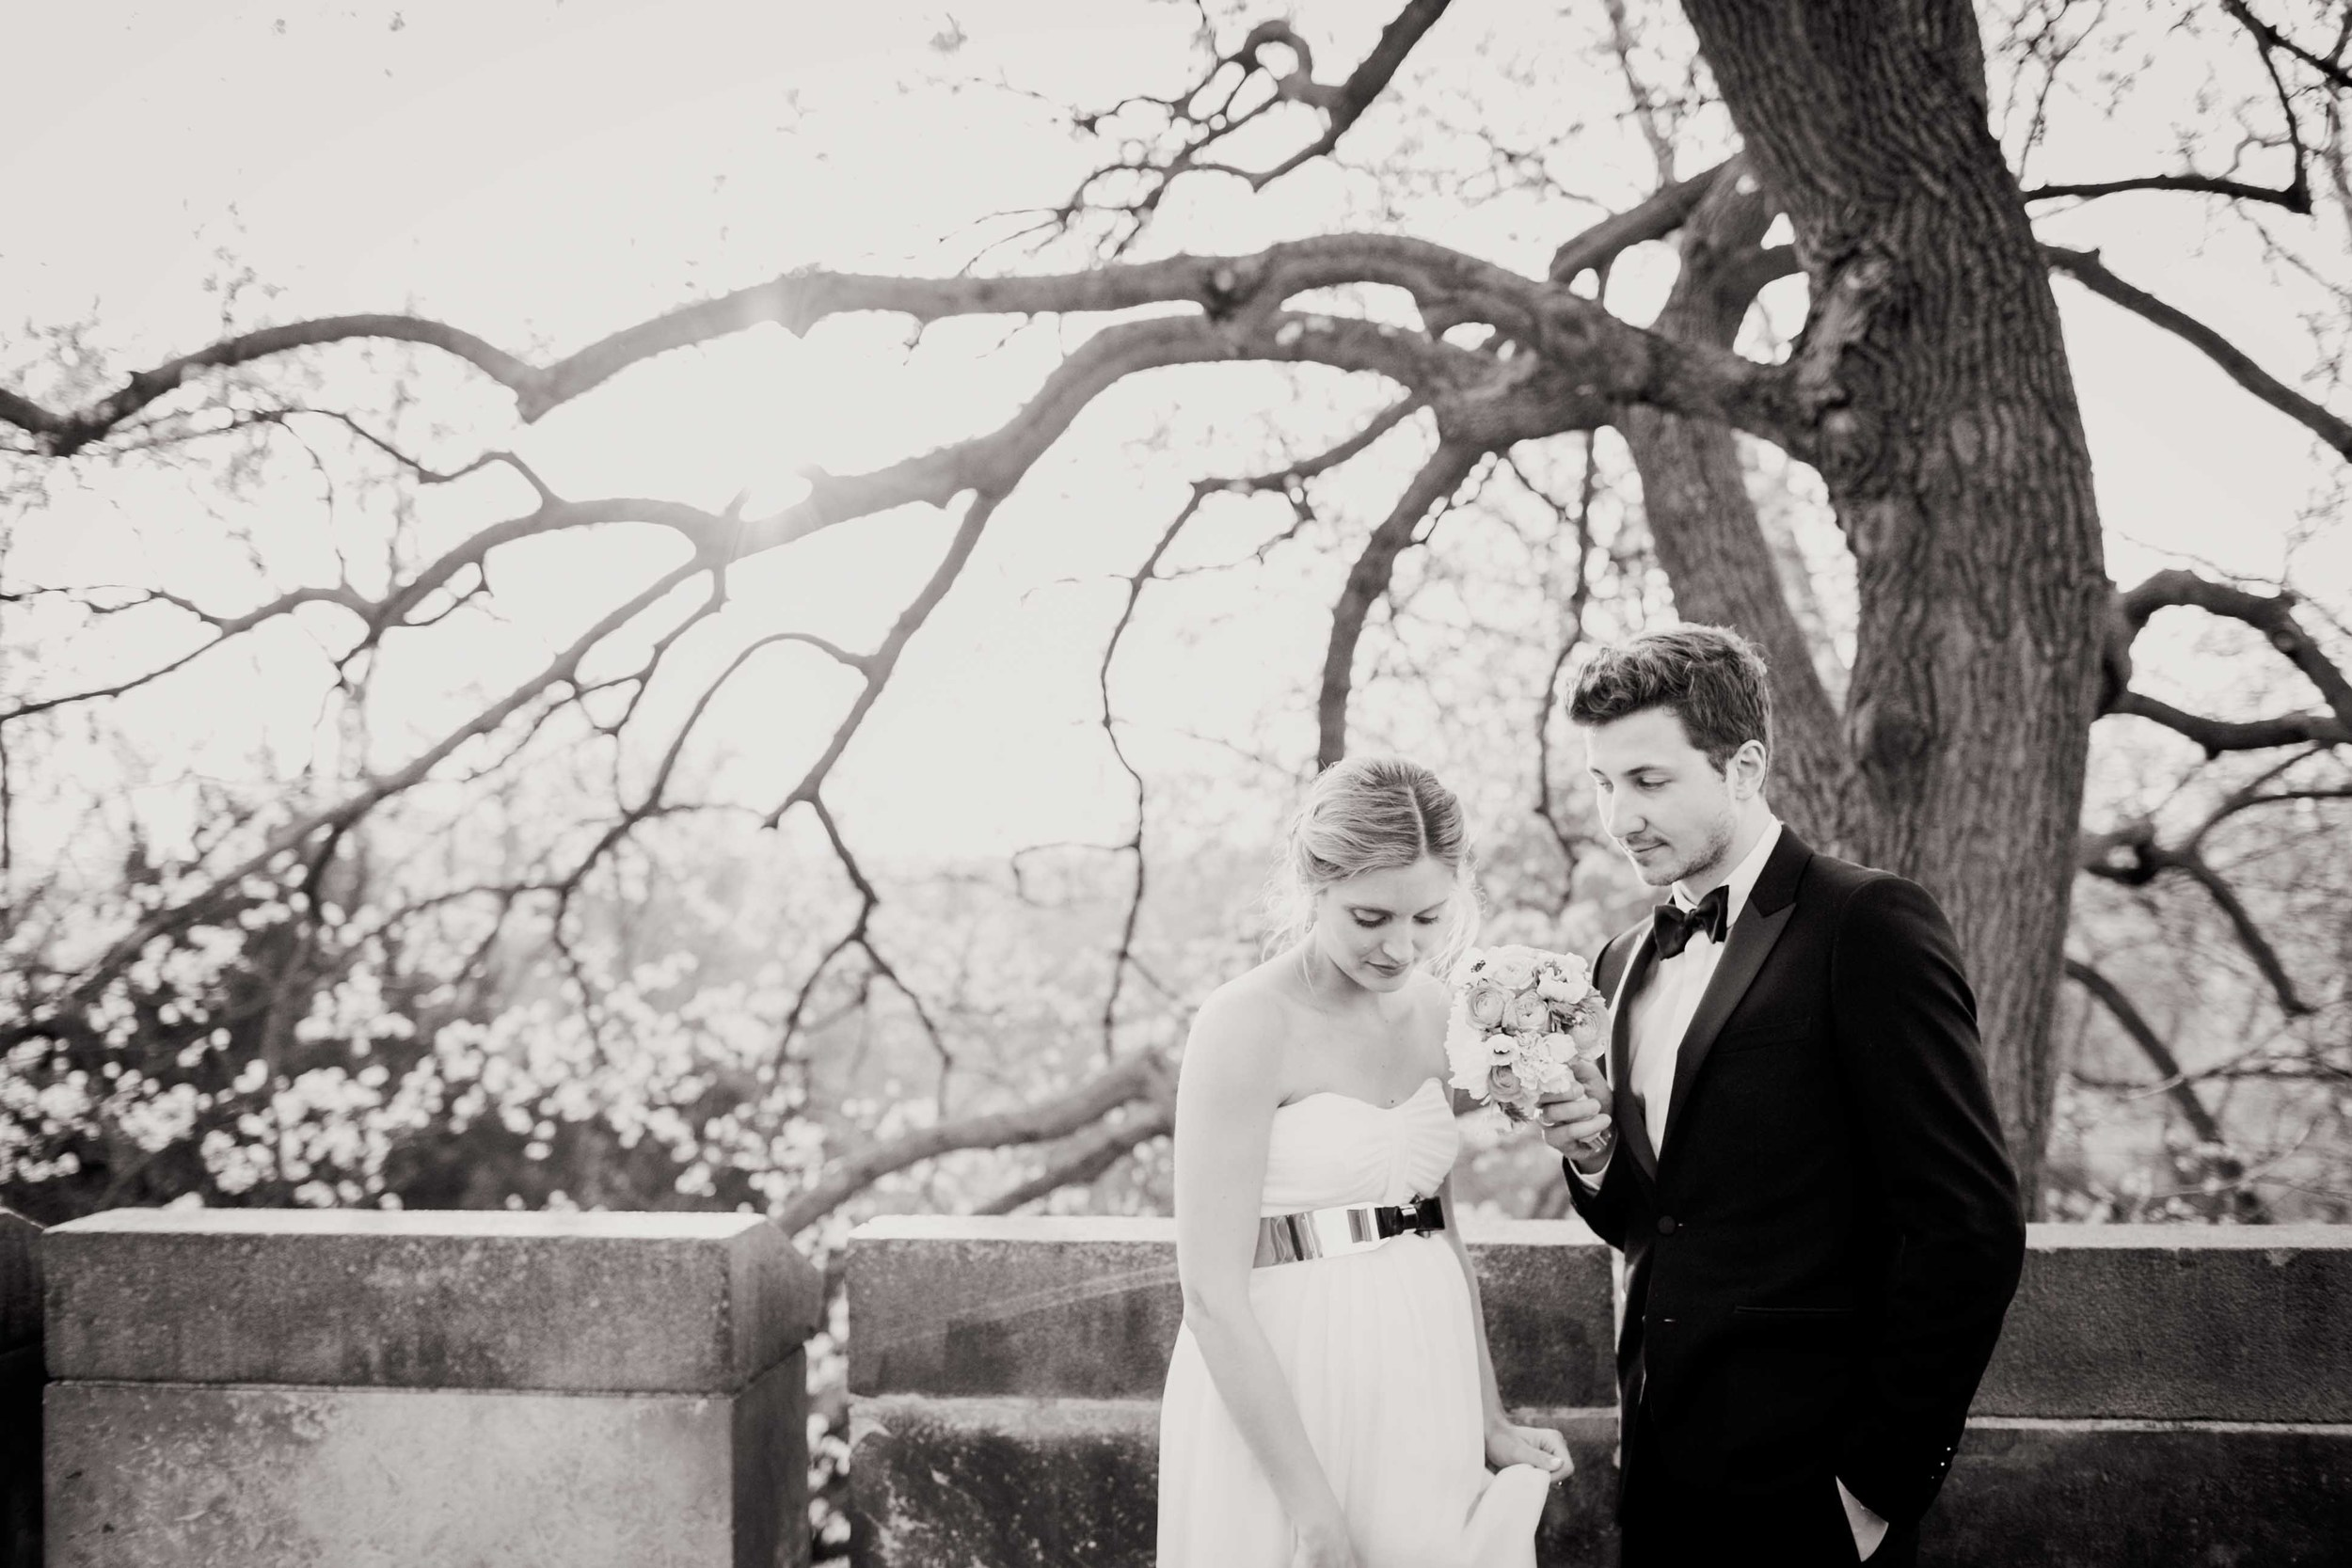 Berlin Hochzeitsfotografie_Fran Burrows Fotografie-119.jpg